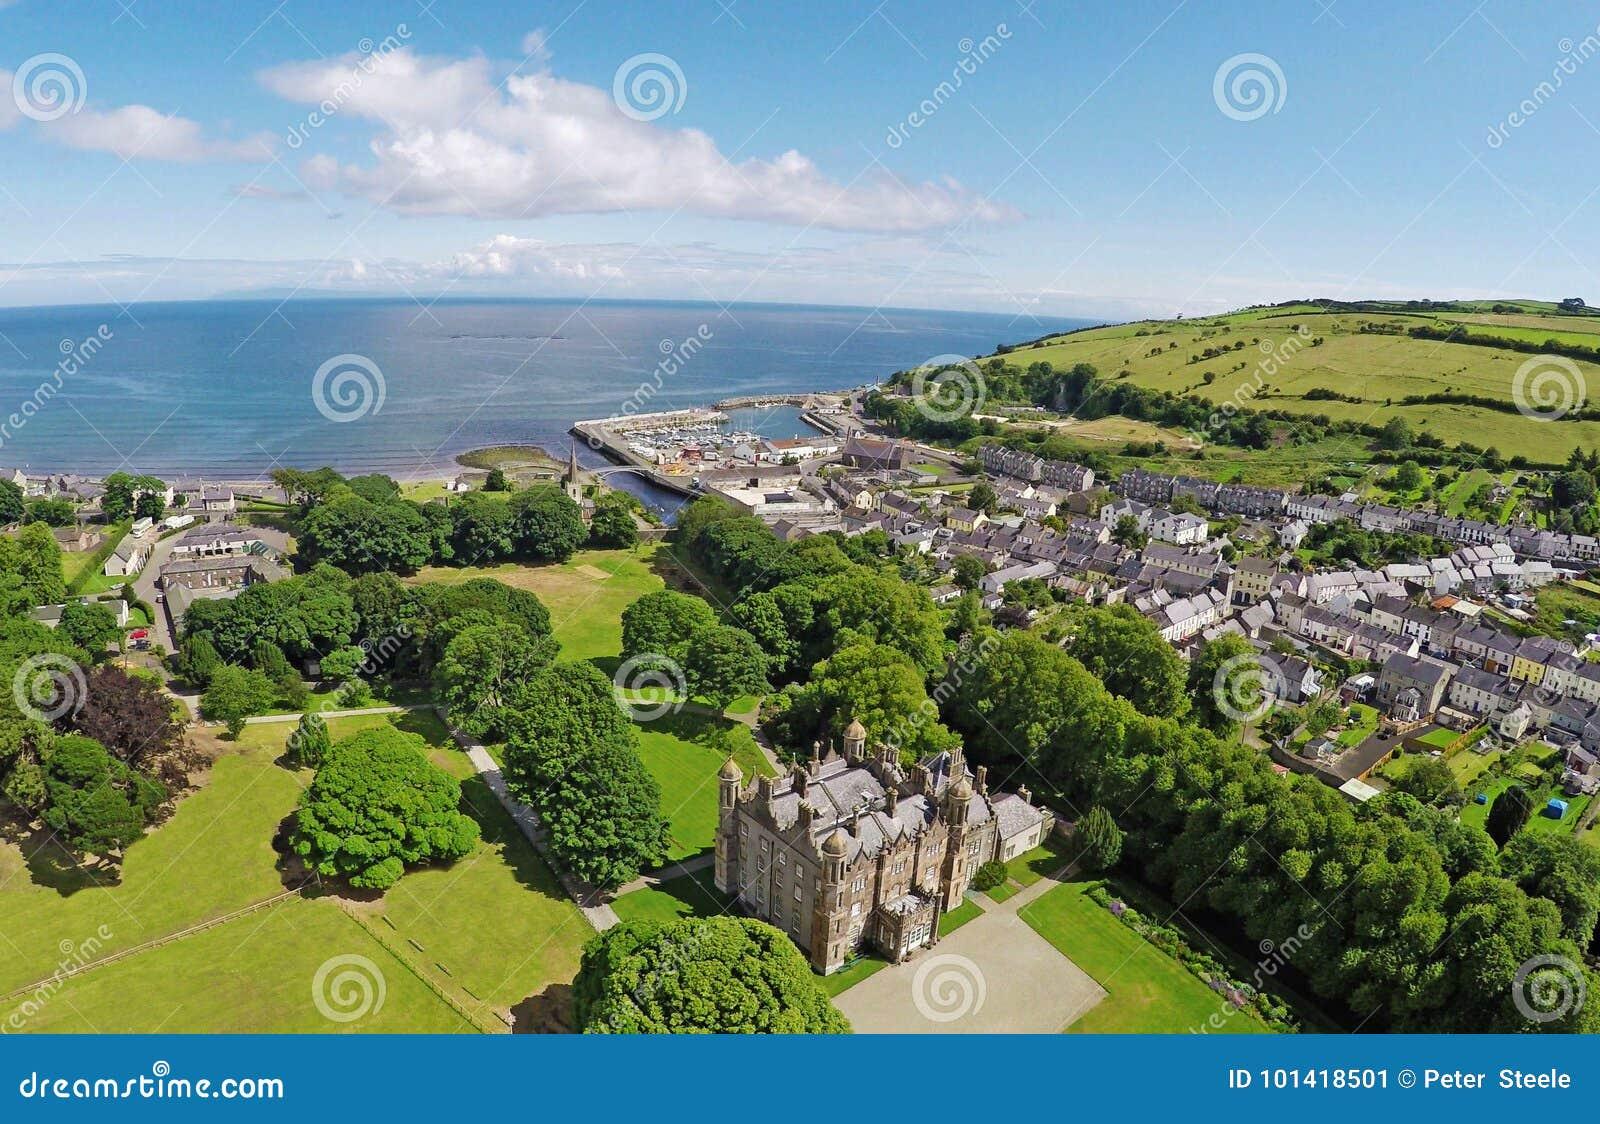 Glenarm Castle Co.Antrim Northern Ireland